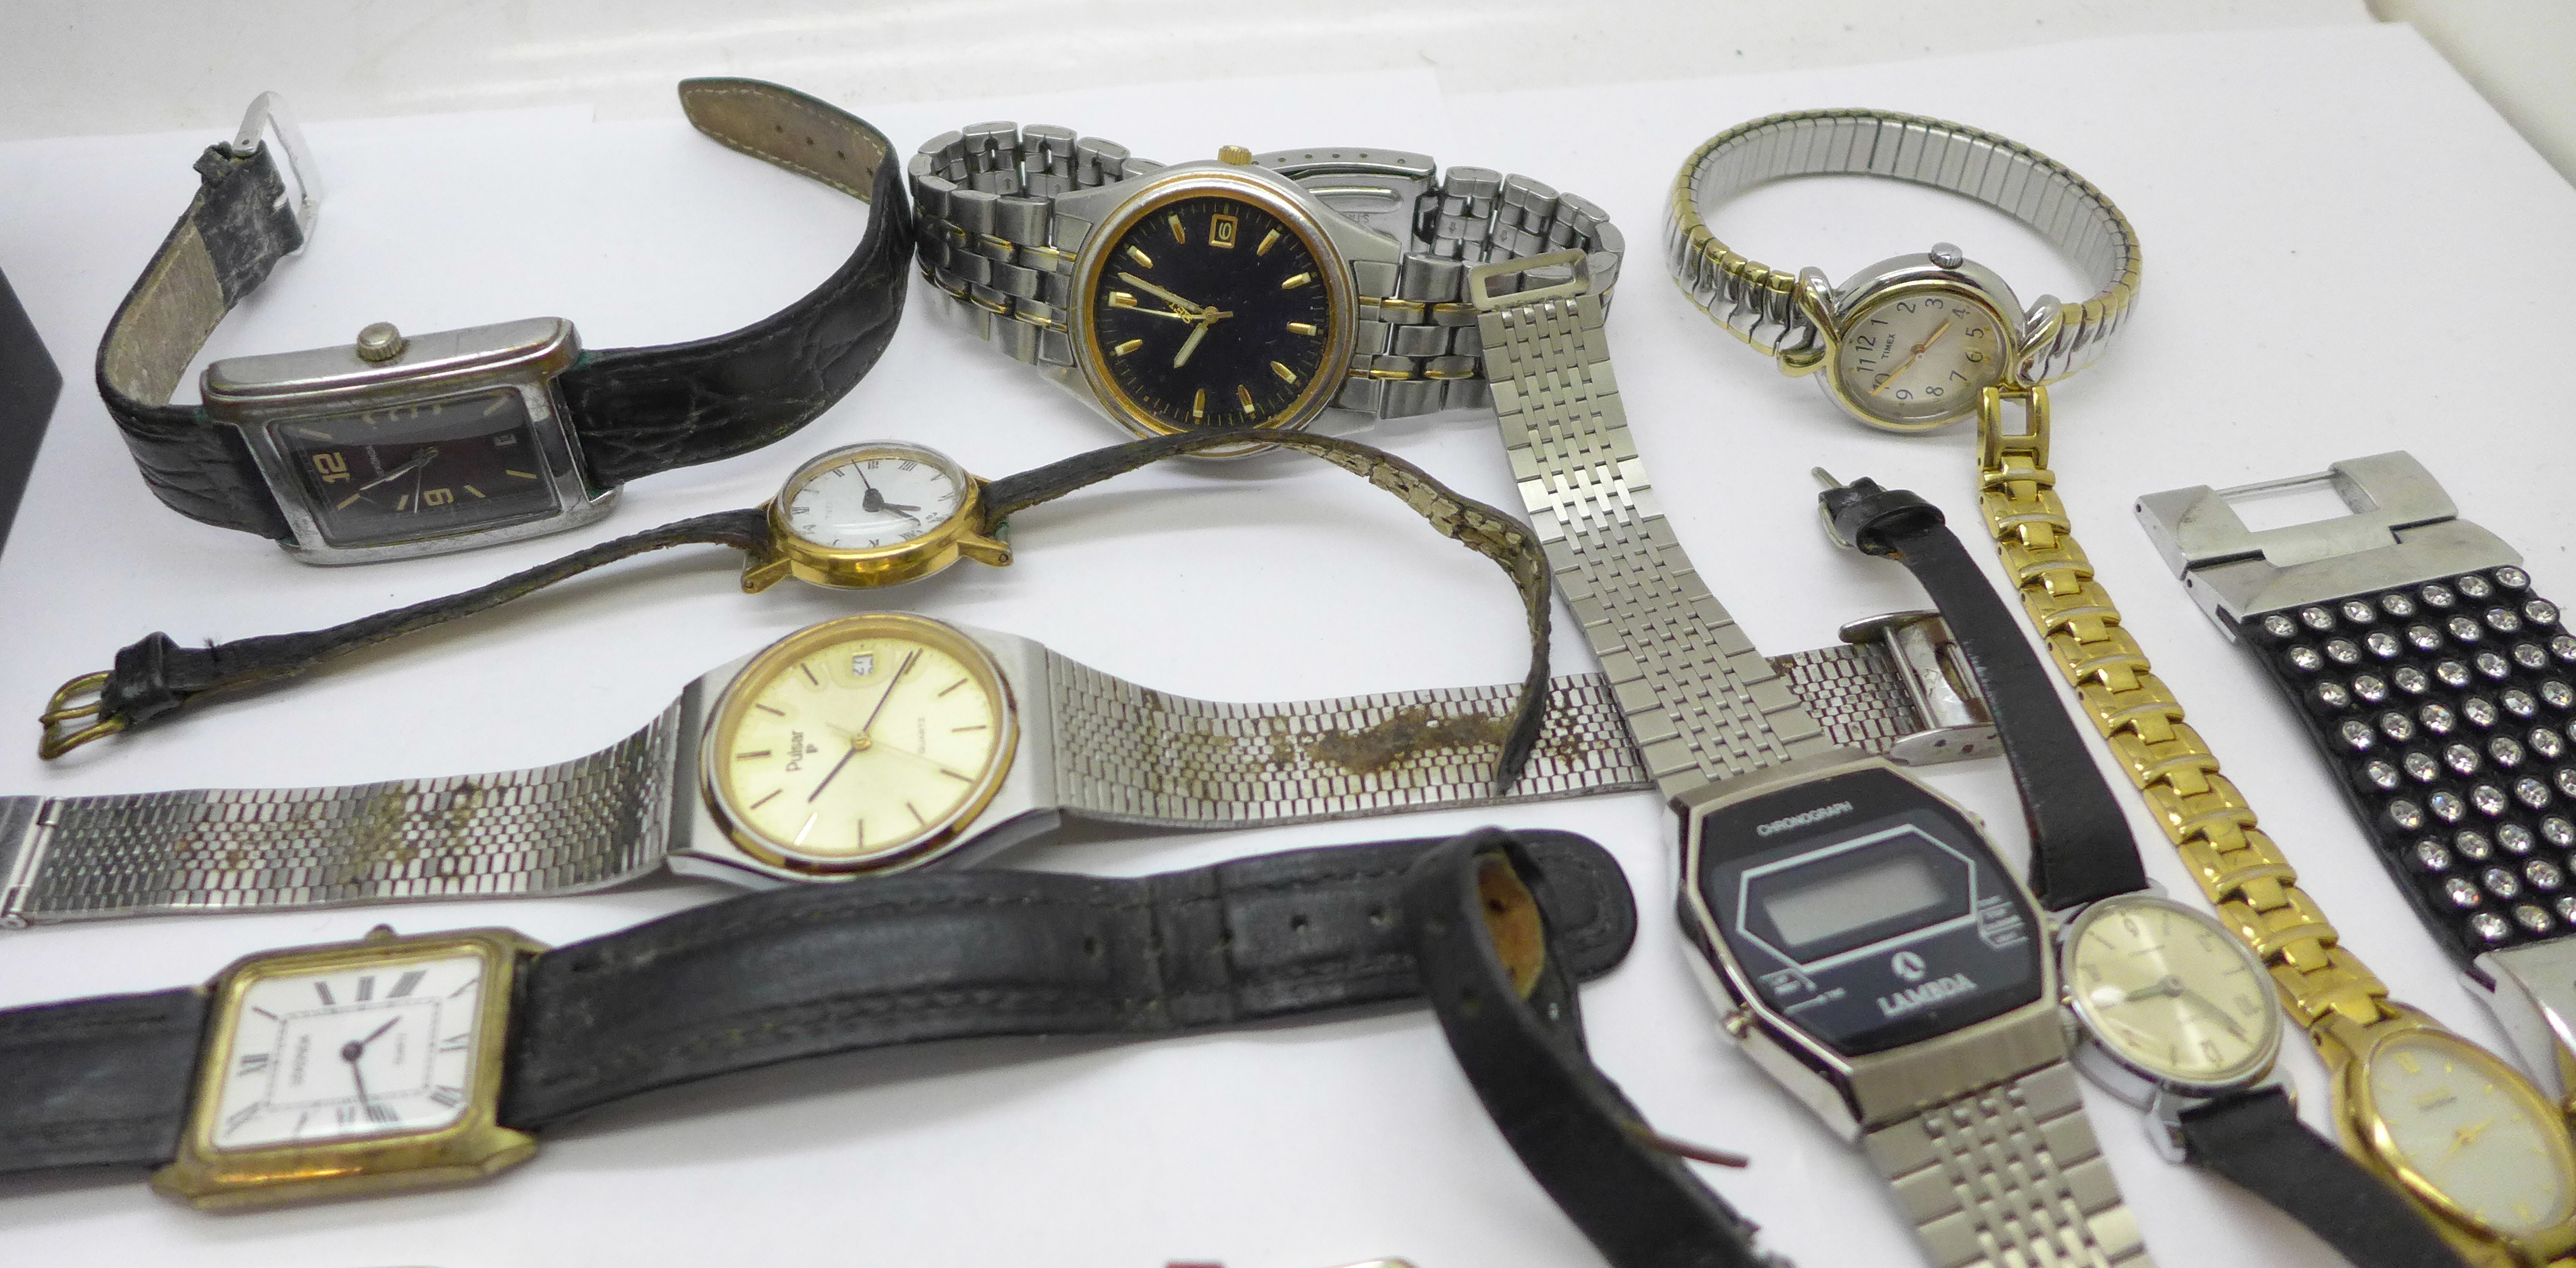 Wristwatches including Sekonda, Seiko, Ingersoll, Rotary, etc. - Image 2 of 5